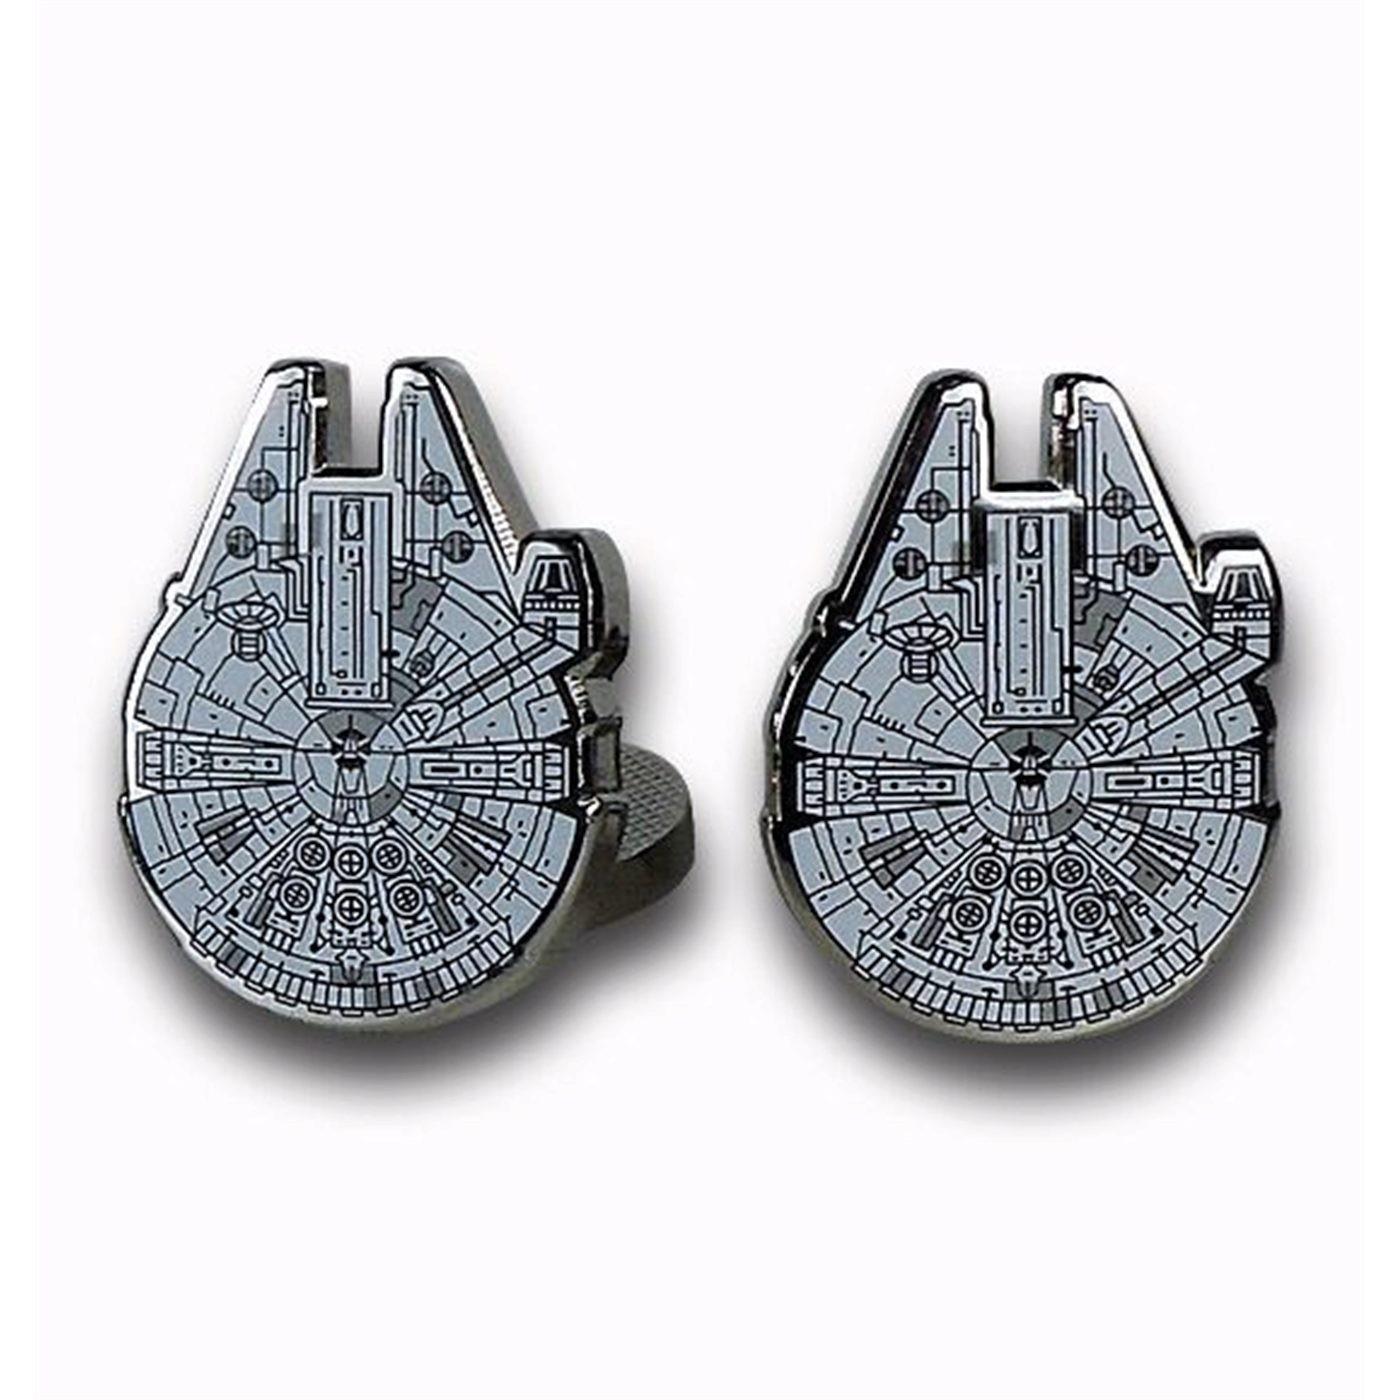 Star Wars Millennium Falcon Cufflinks